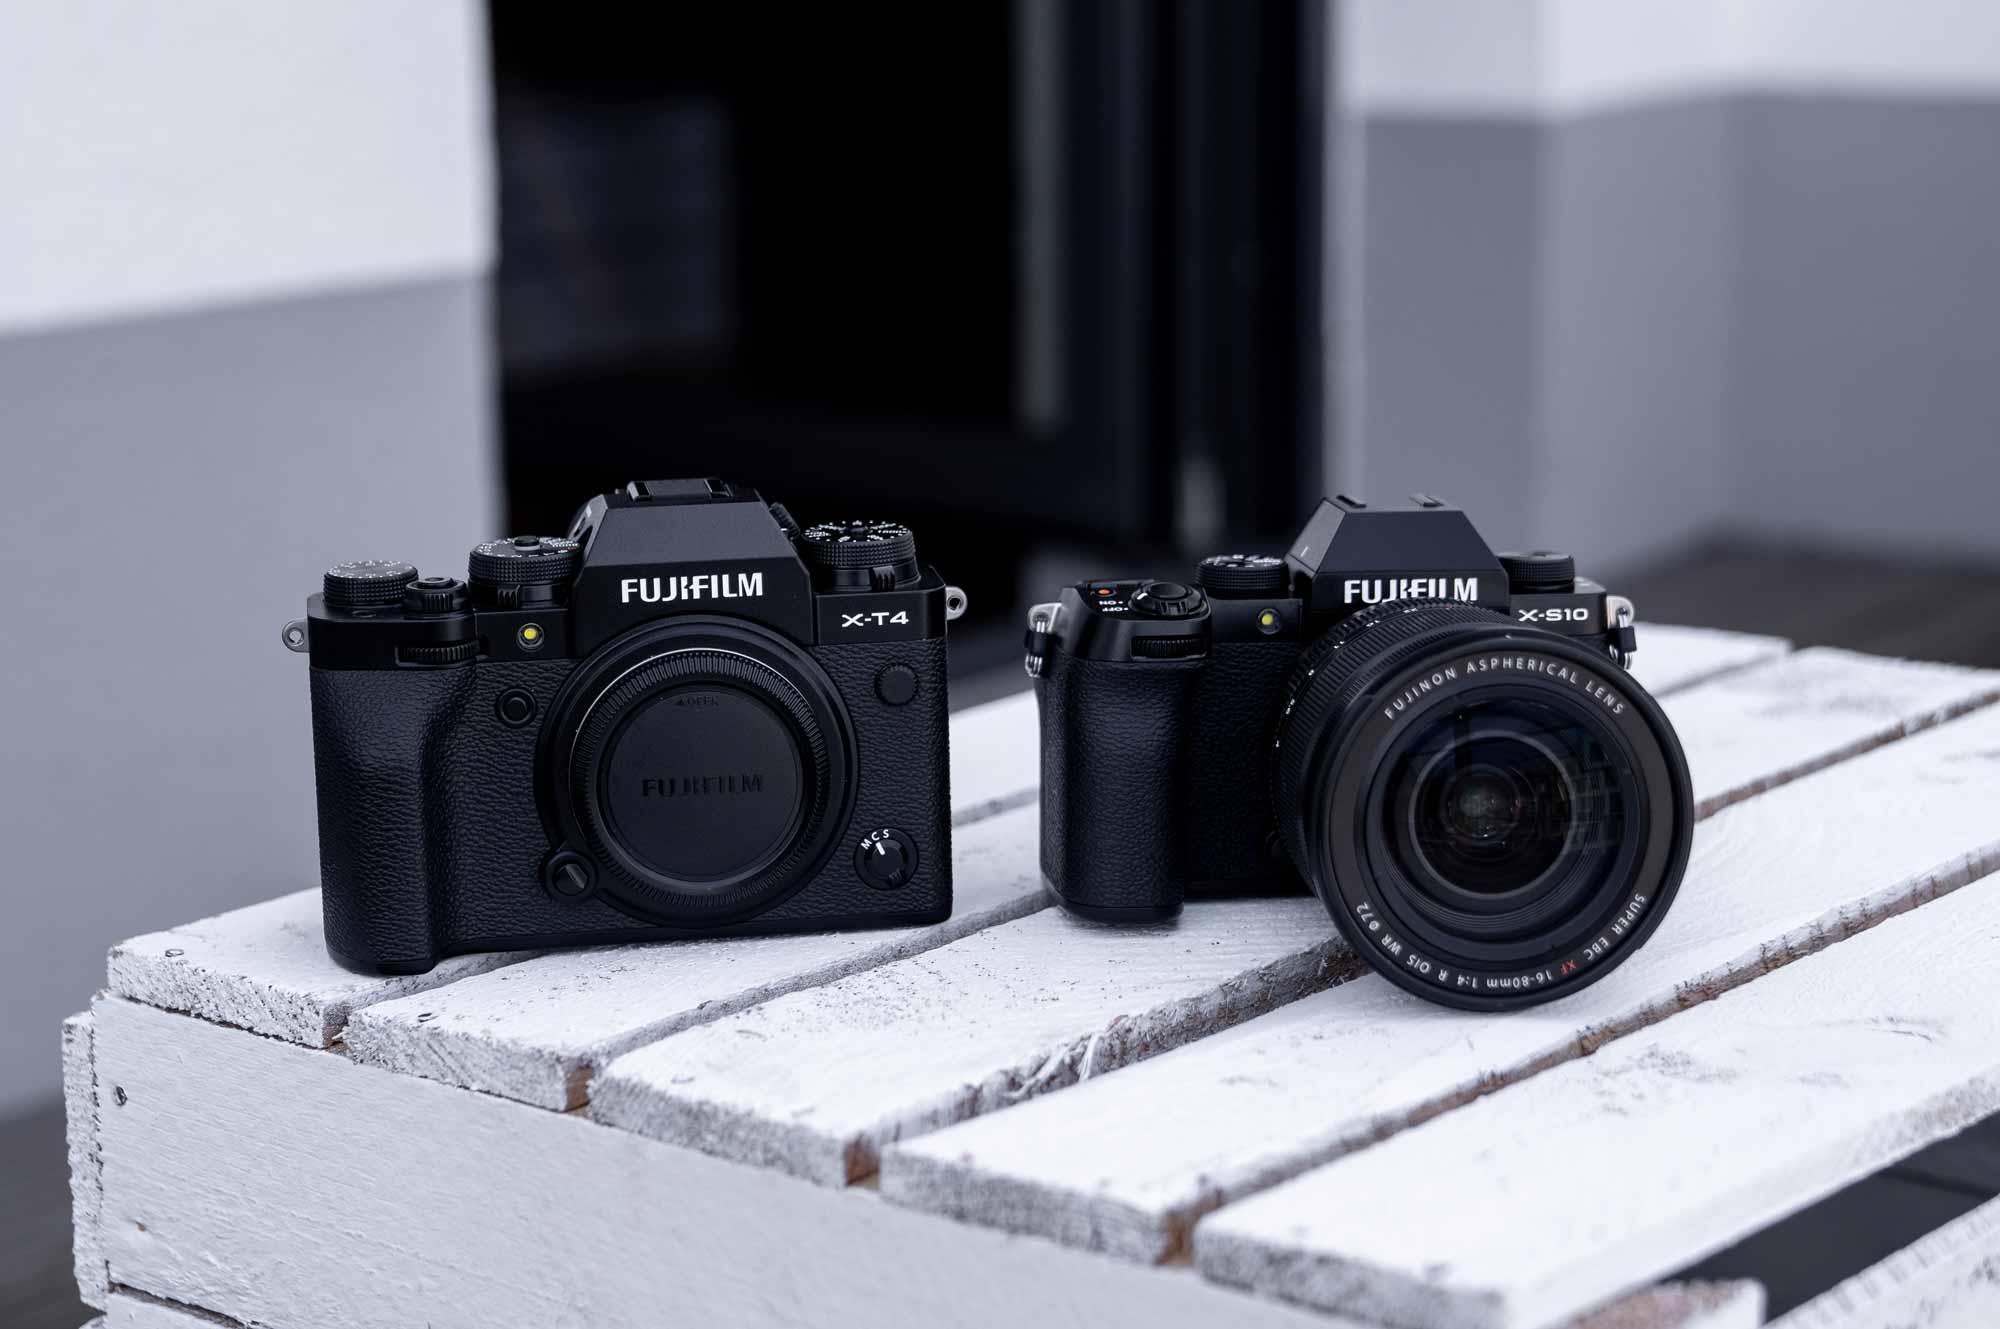 Fujifilm X-S10 und X-T4